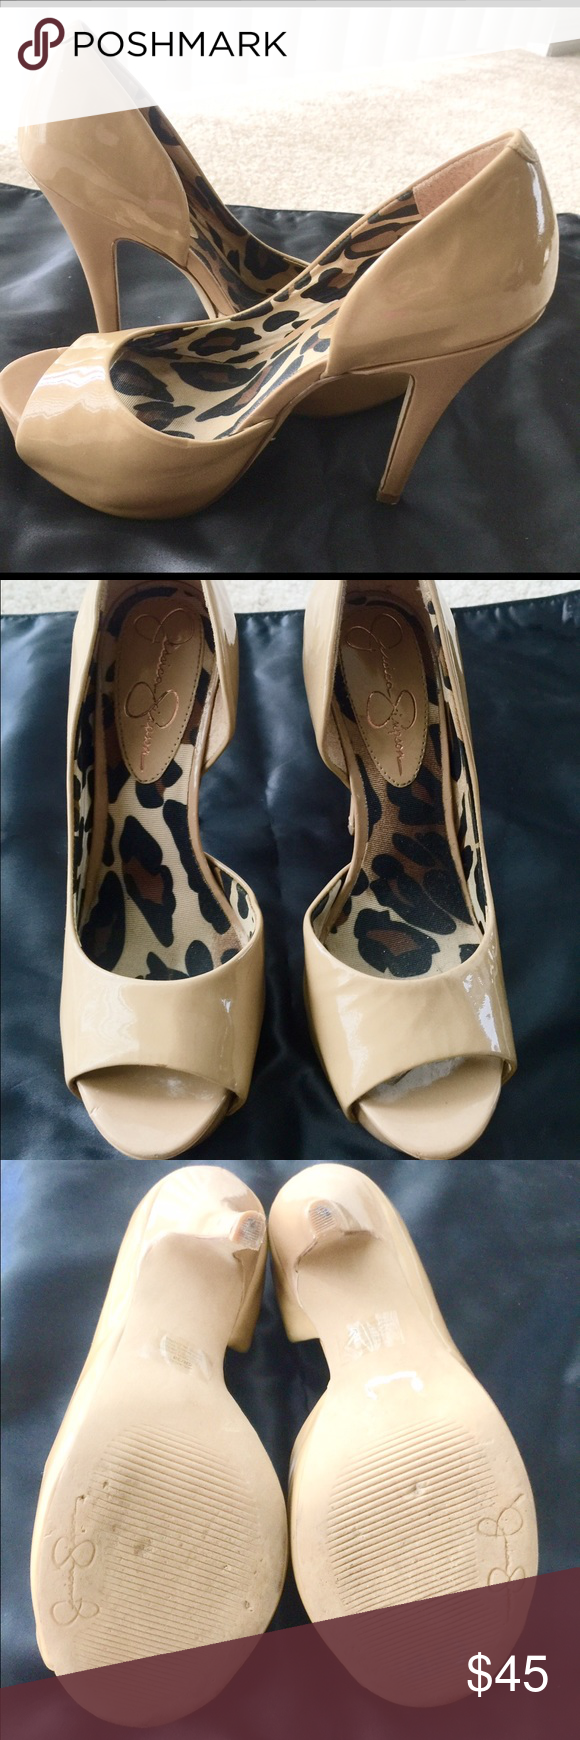 "5"" heels very cute. In great shape. Jessica Simpson 5"" heels excellent condition. Jessica Simpson Shoes Heels"